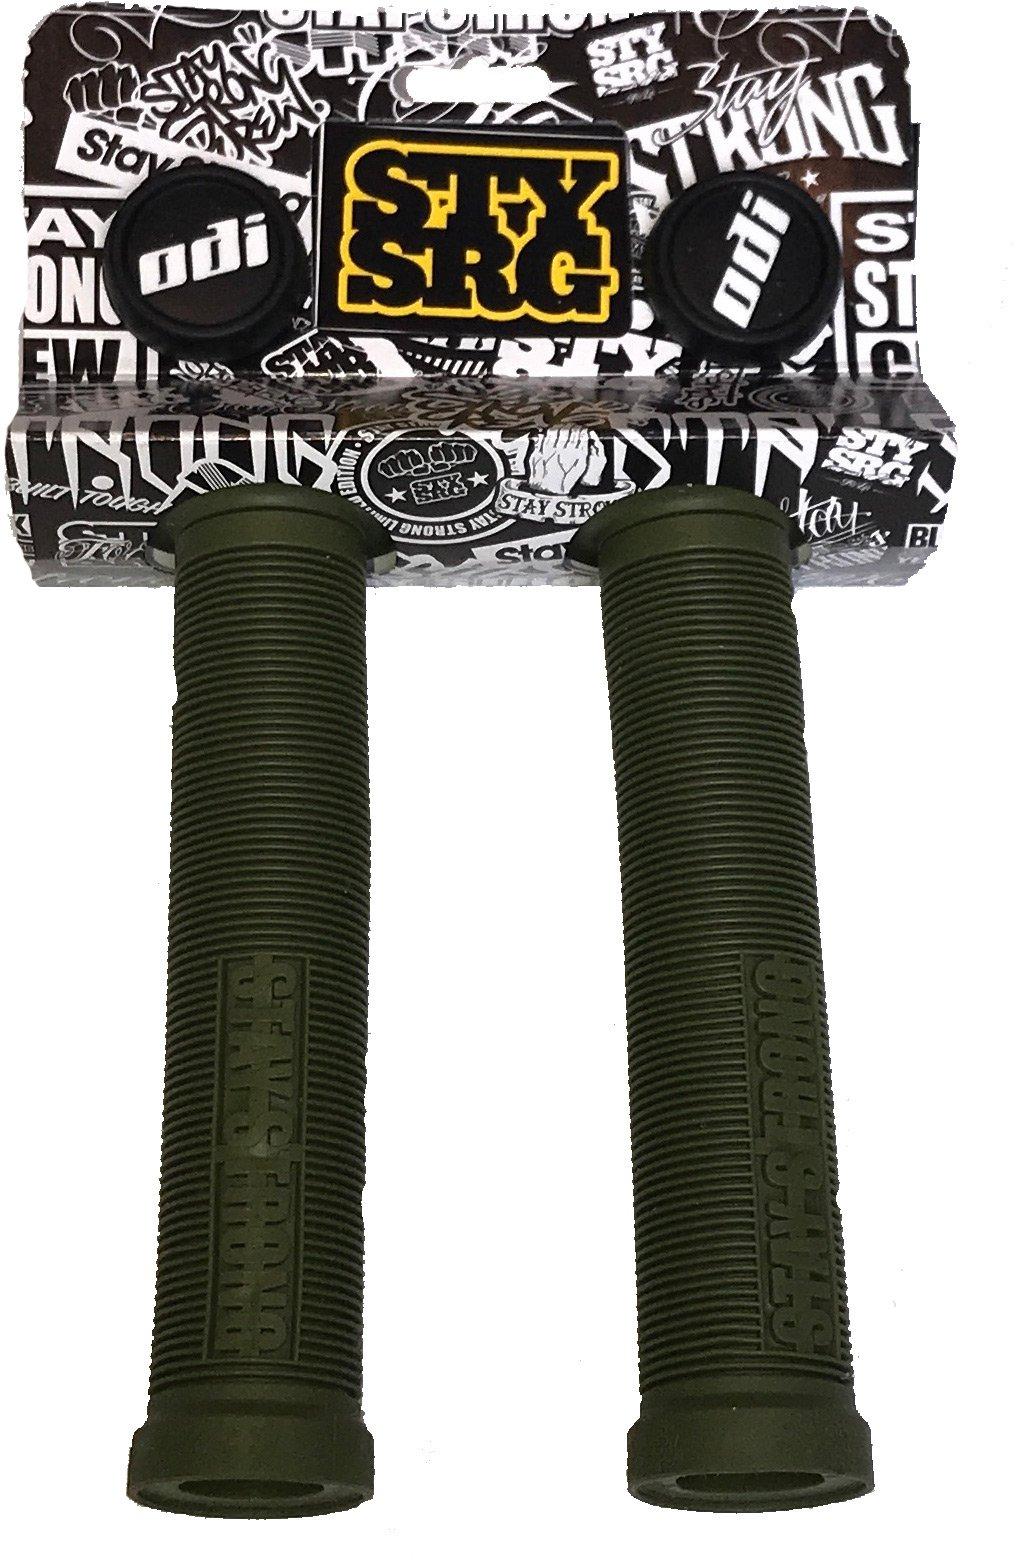 Pro Lt Handlebar Compact 31.8 Black